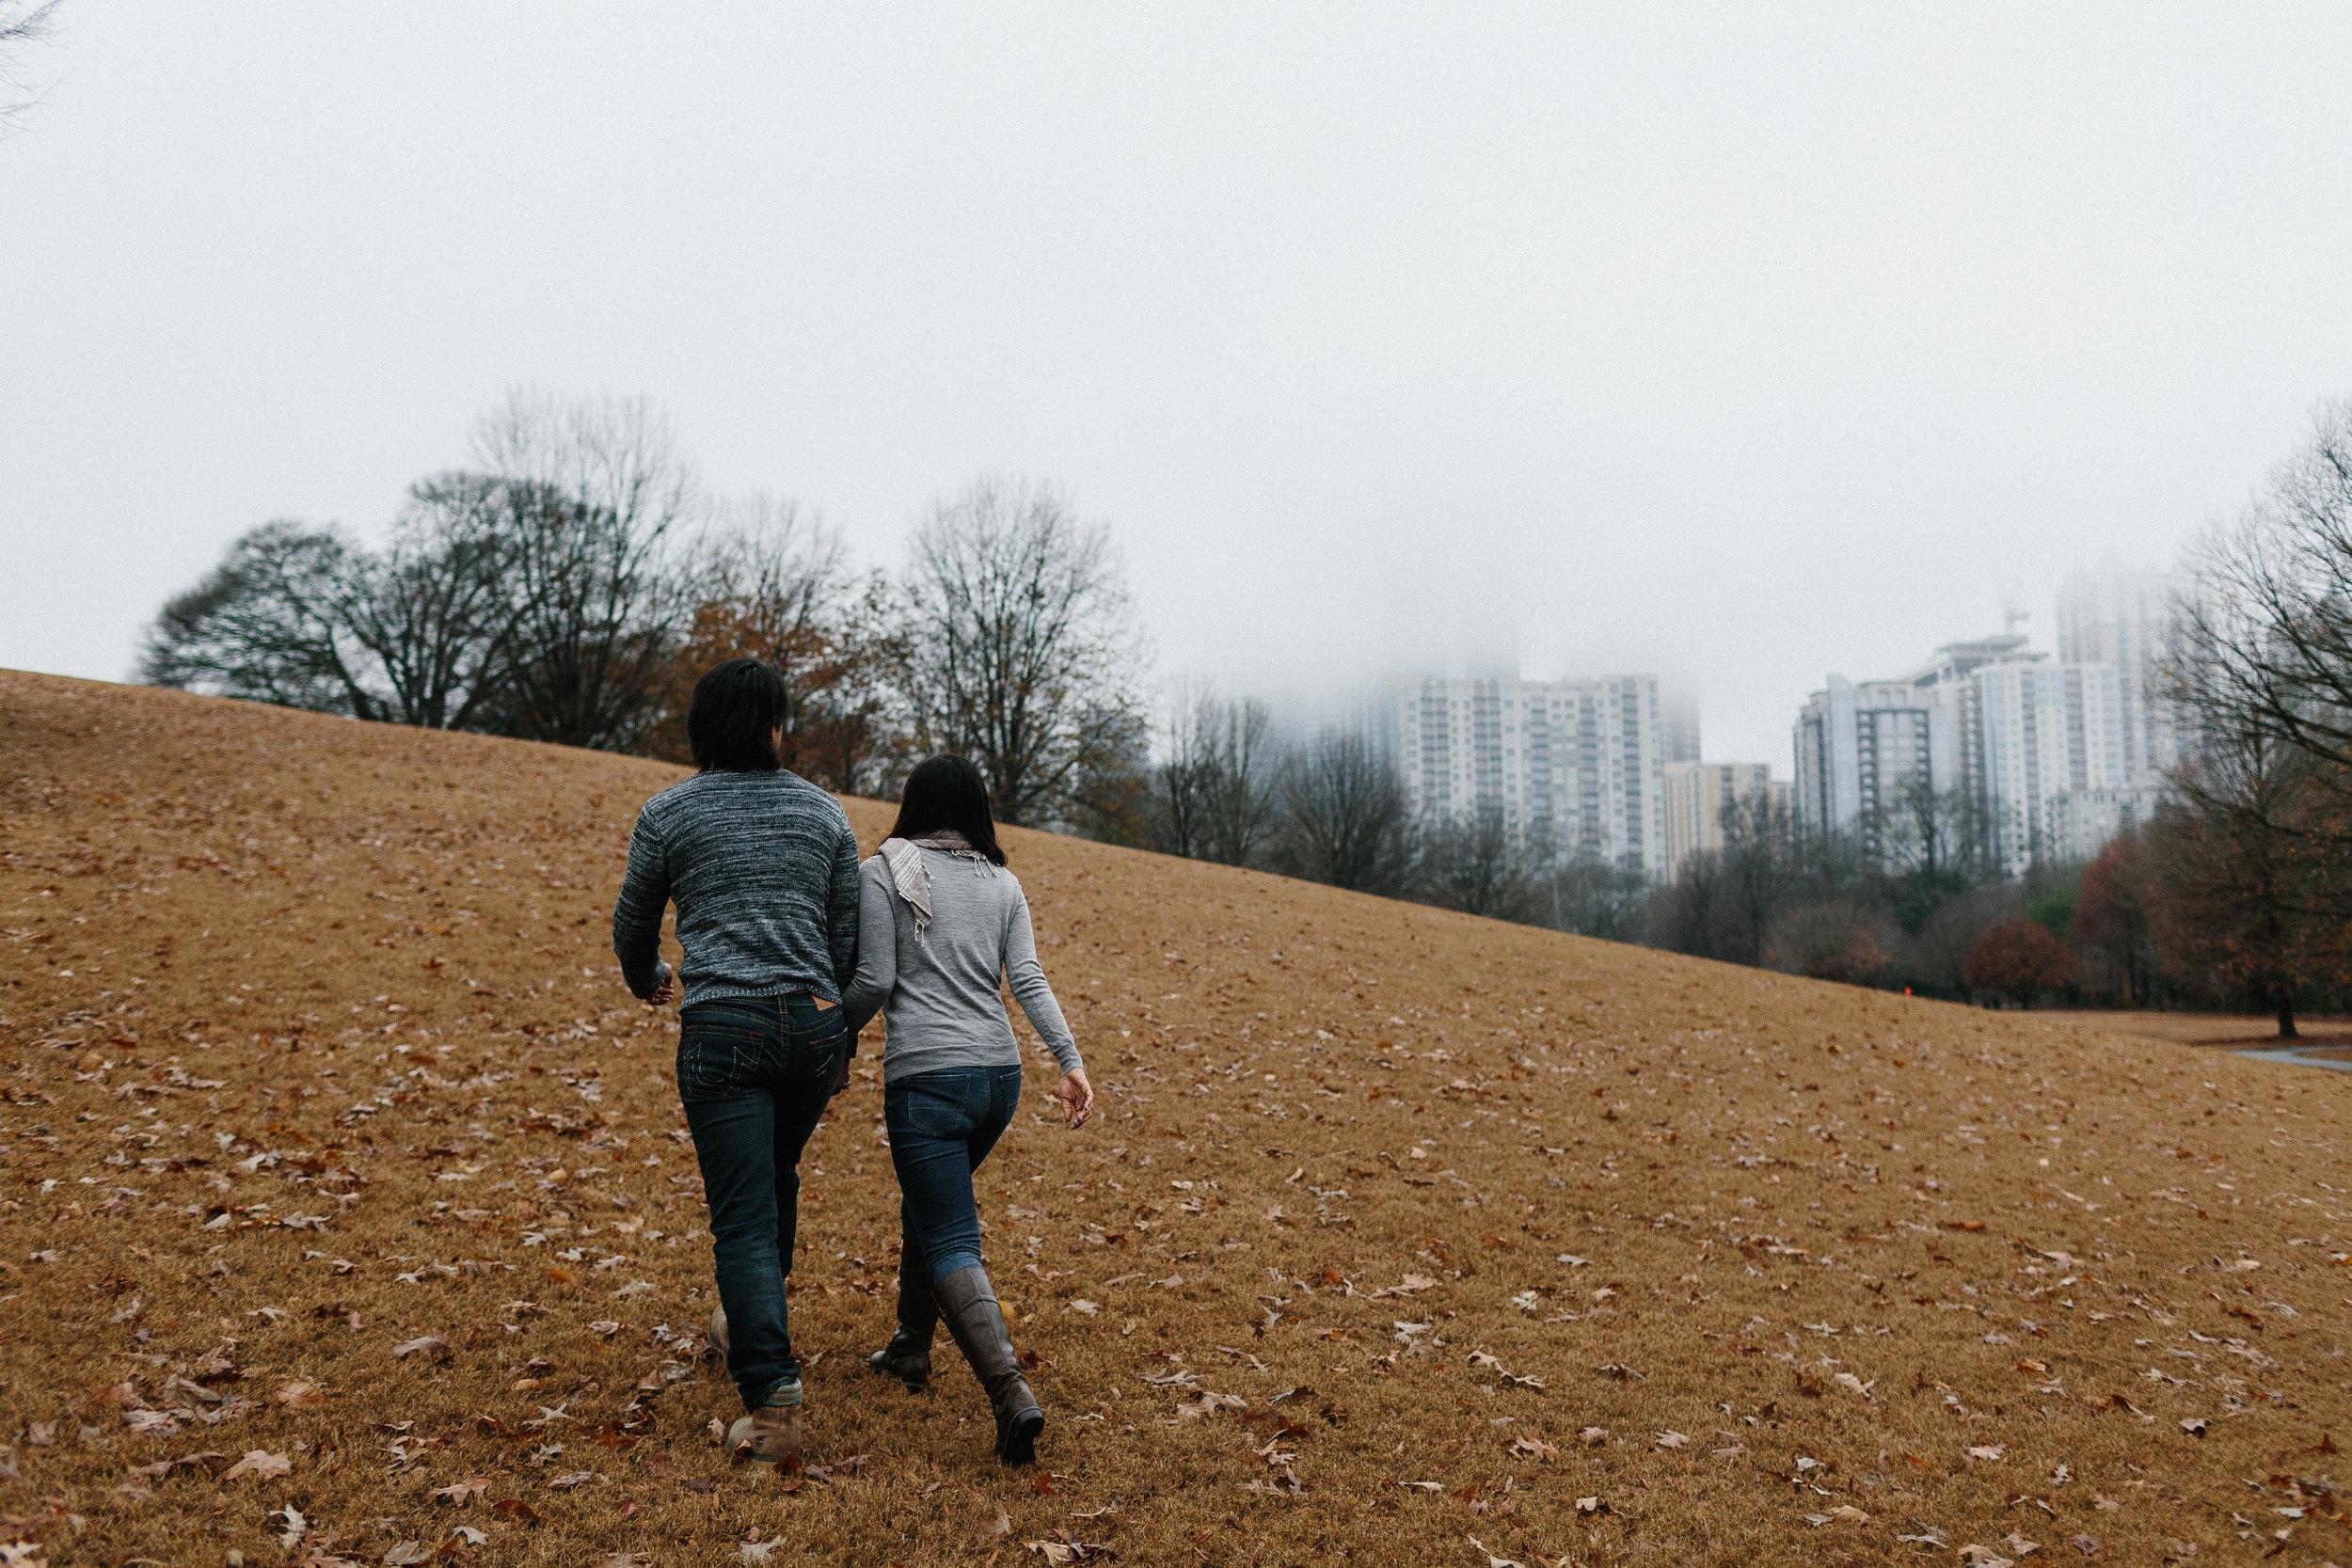 atlanta_gloomy_day_rainy_engagement_couple_lifestyle_fun_playful_artistic_georgia_photographer_2014.jpg